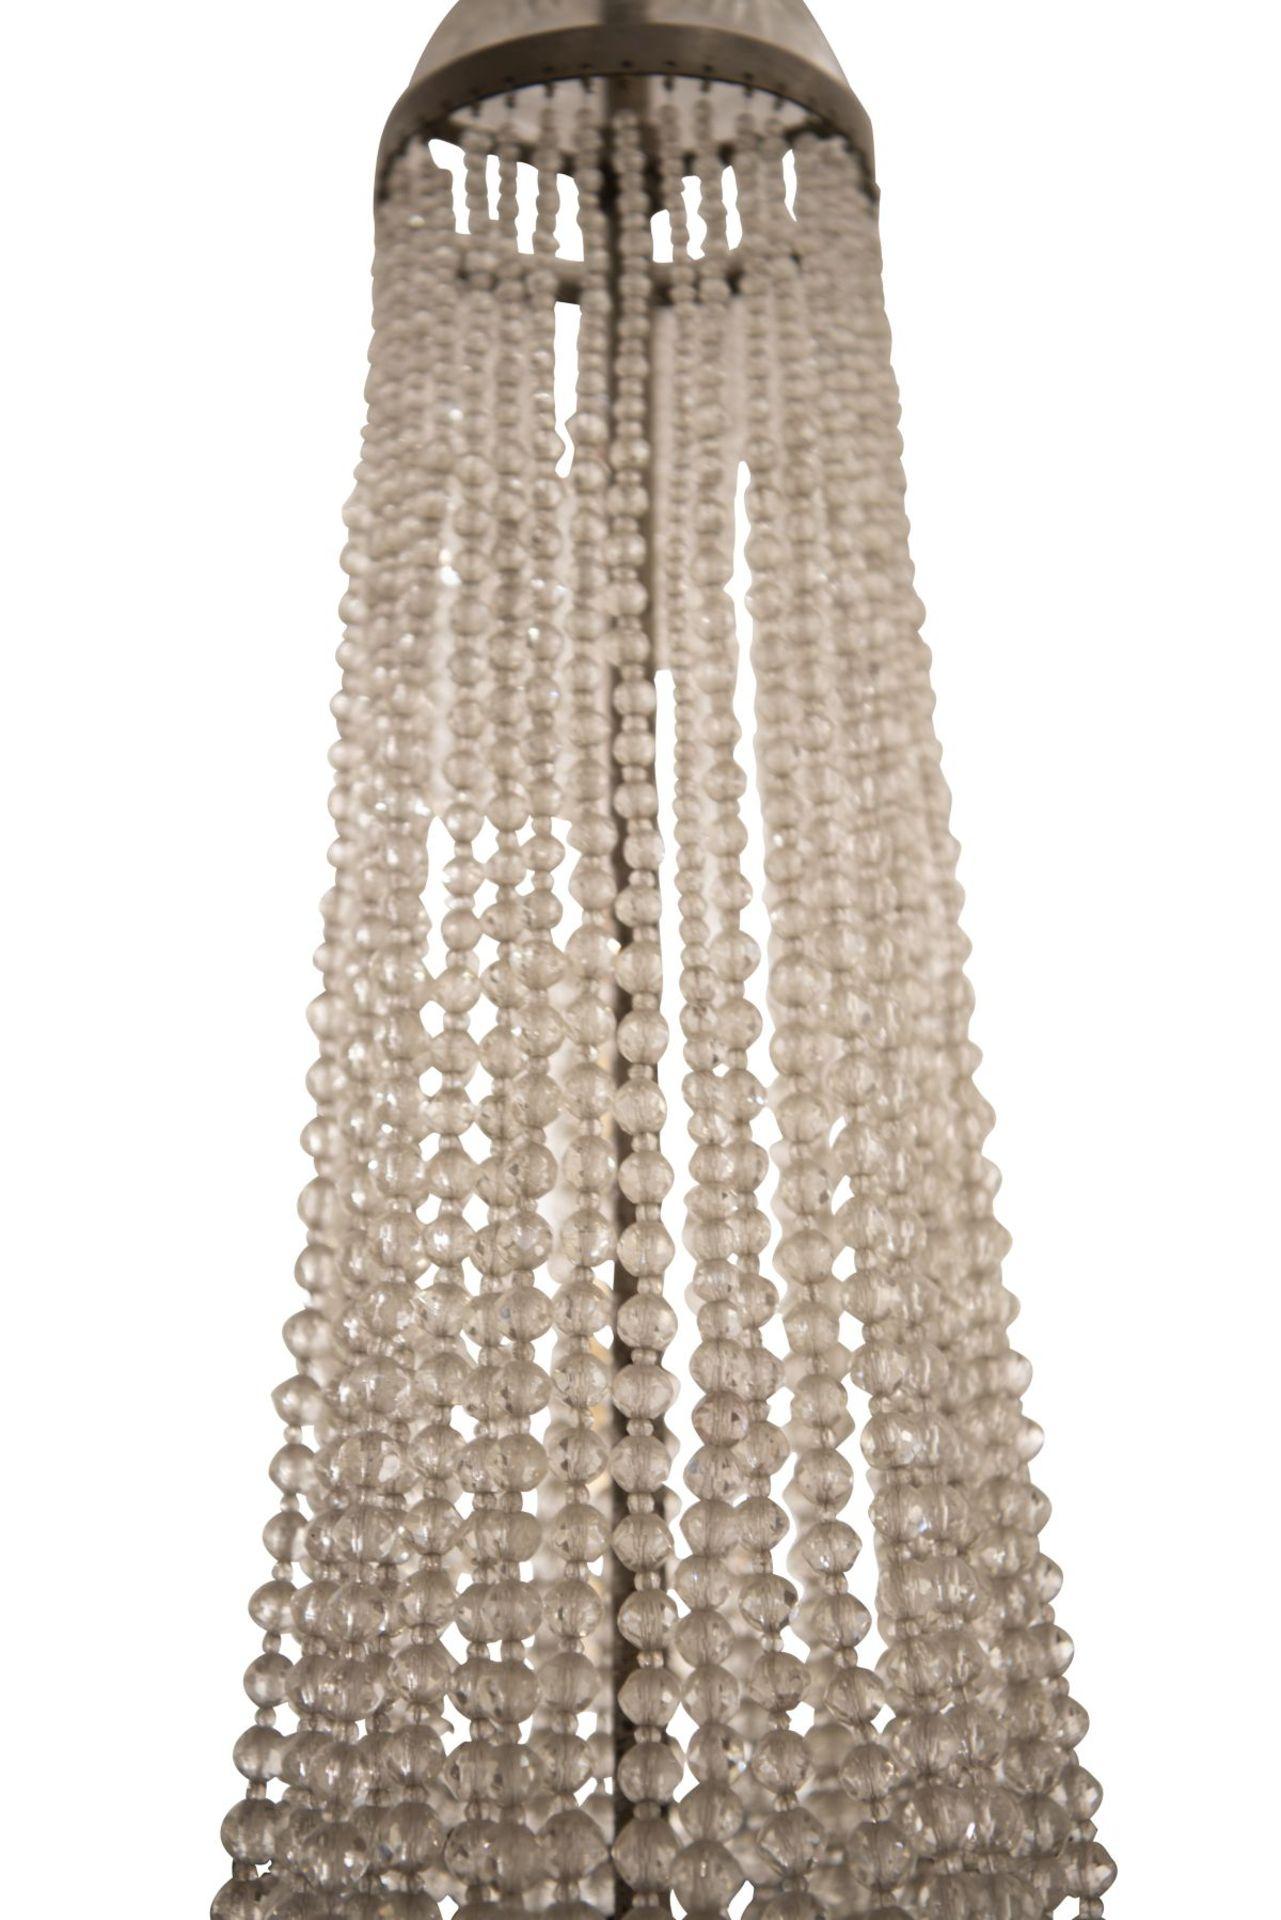 Decorative chandelier - Image 4 of 4